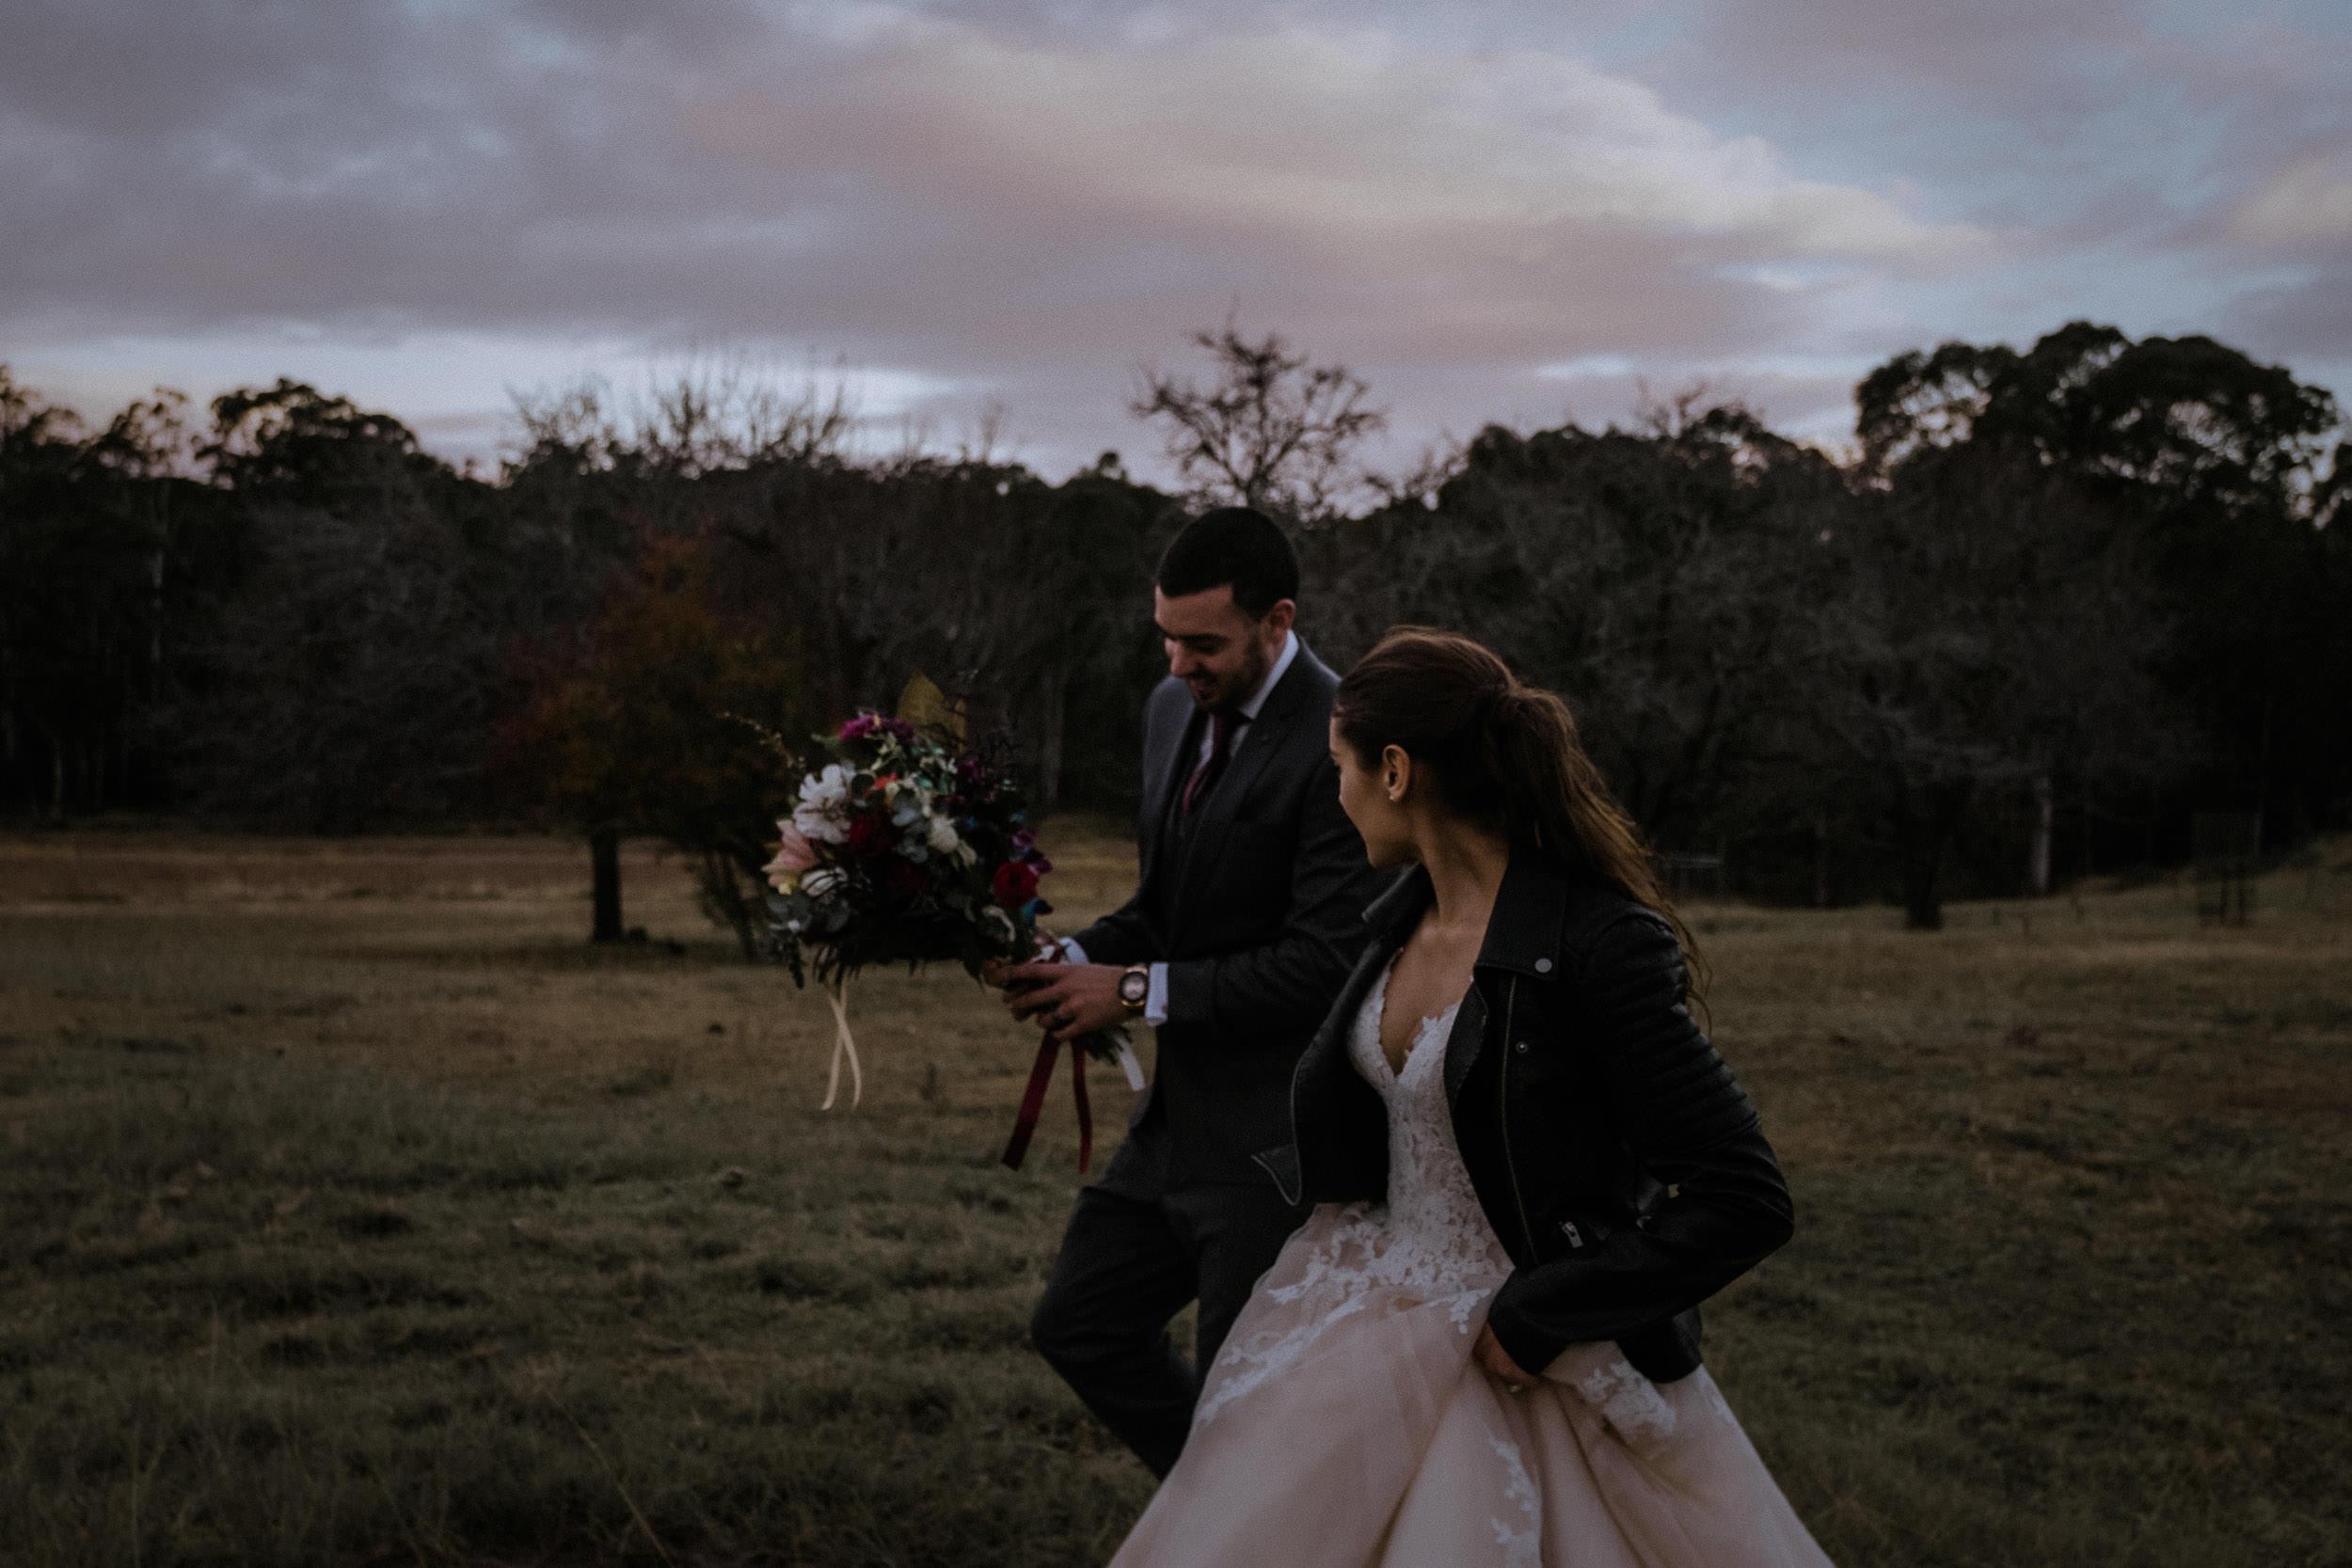 g_c wedding - kings _ thieves elopement wedding photography - blog 74.jpg